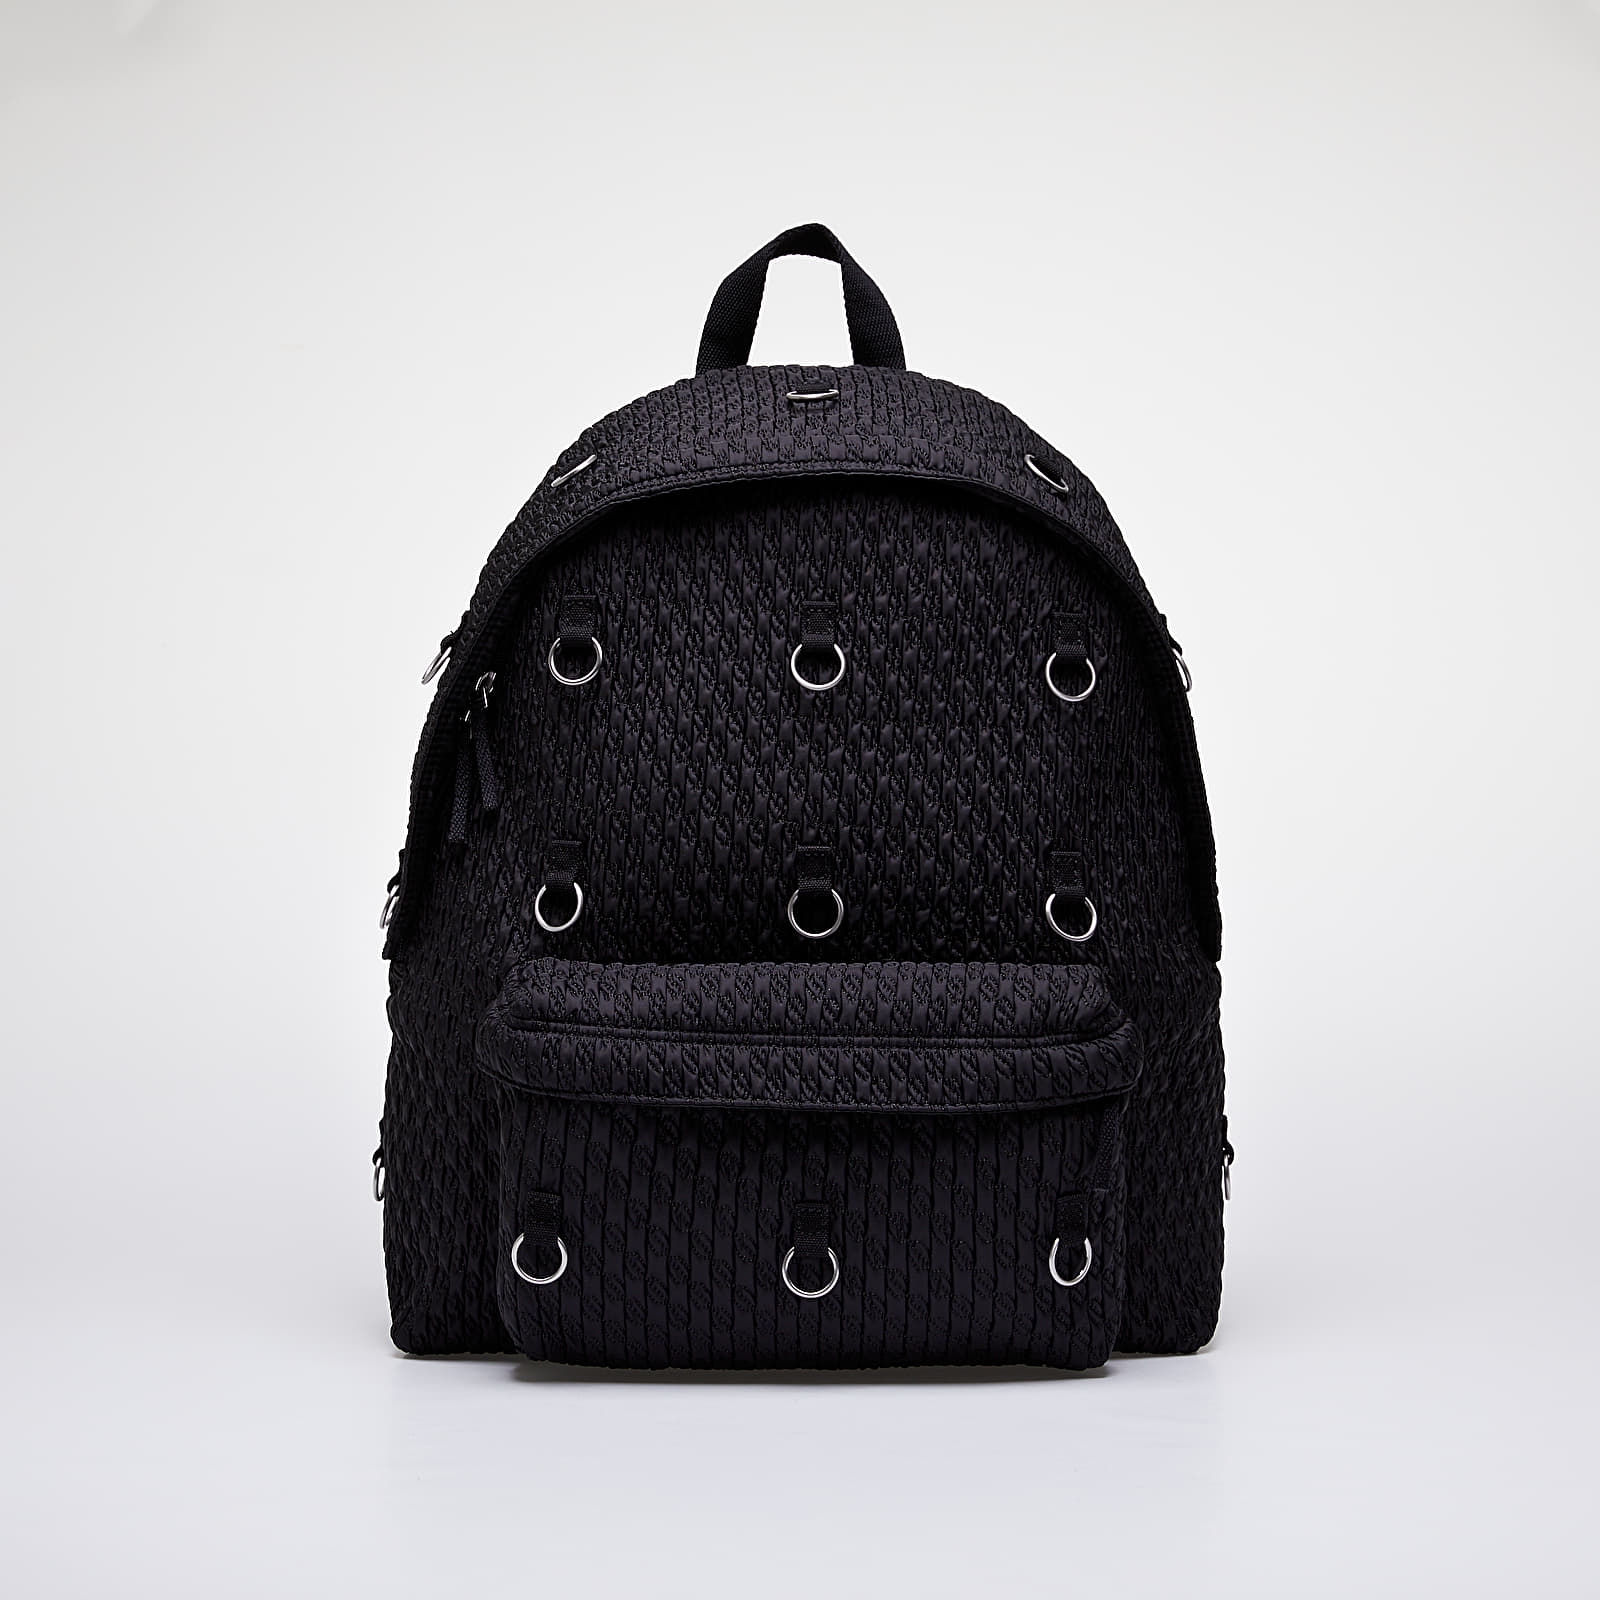 Batohy Eastpak x Raf Simons Padded Loop Bag Black Matlas